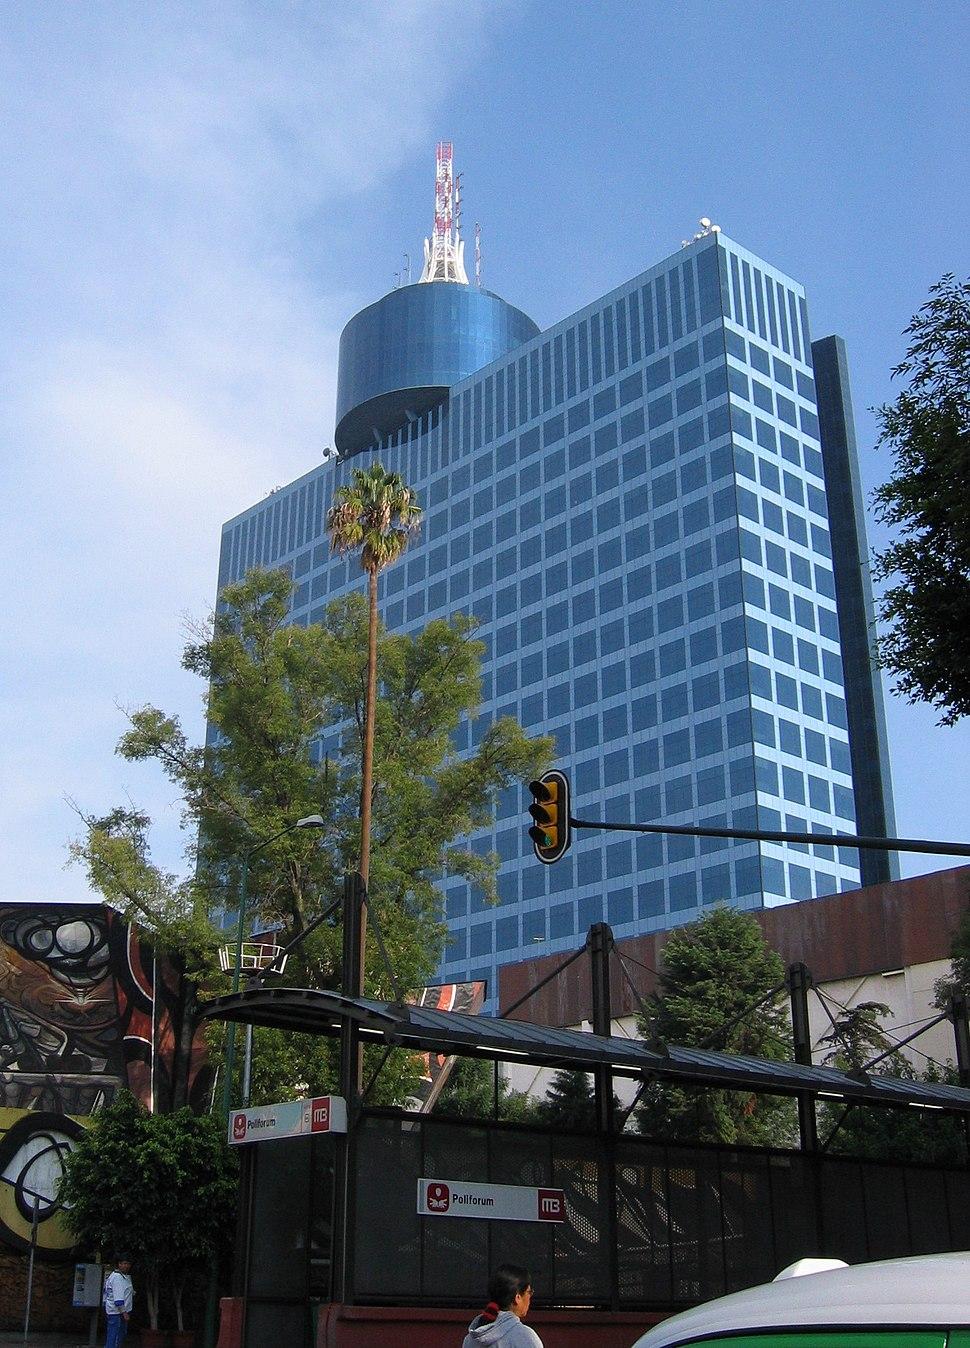 Torre wtc mexico